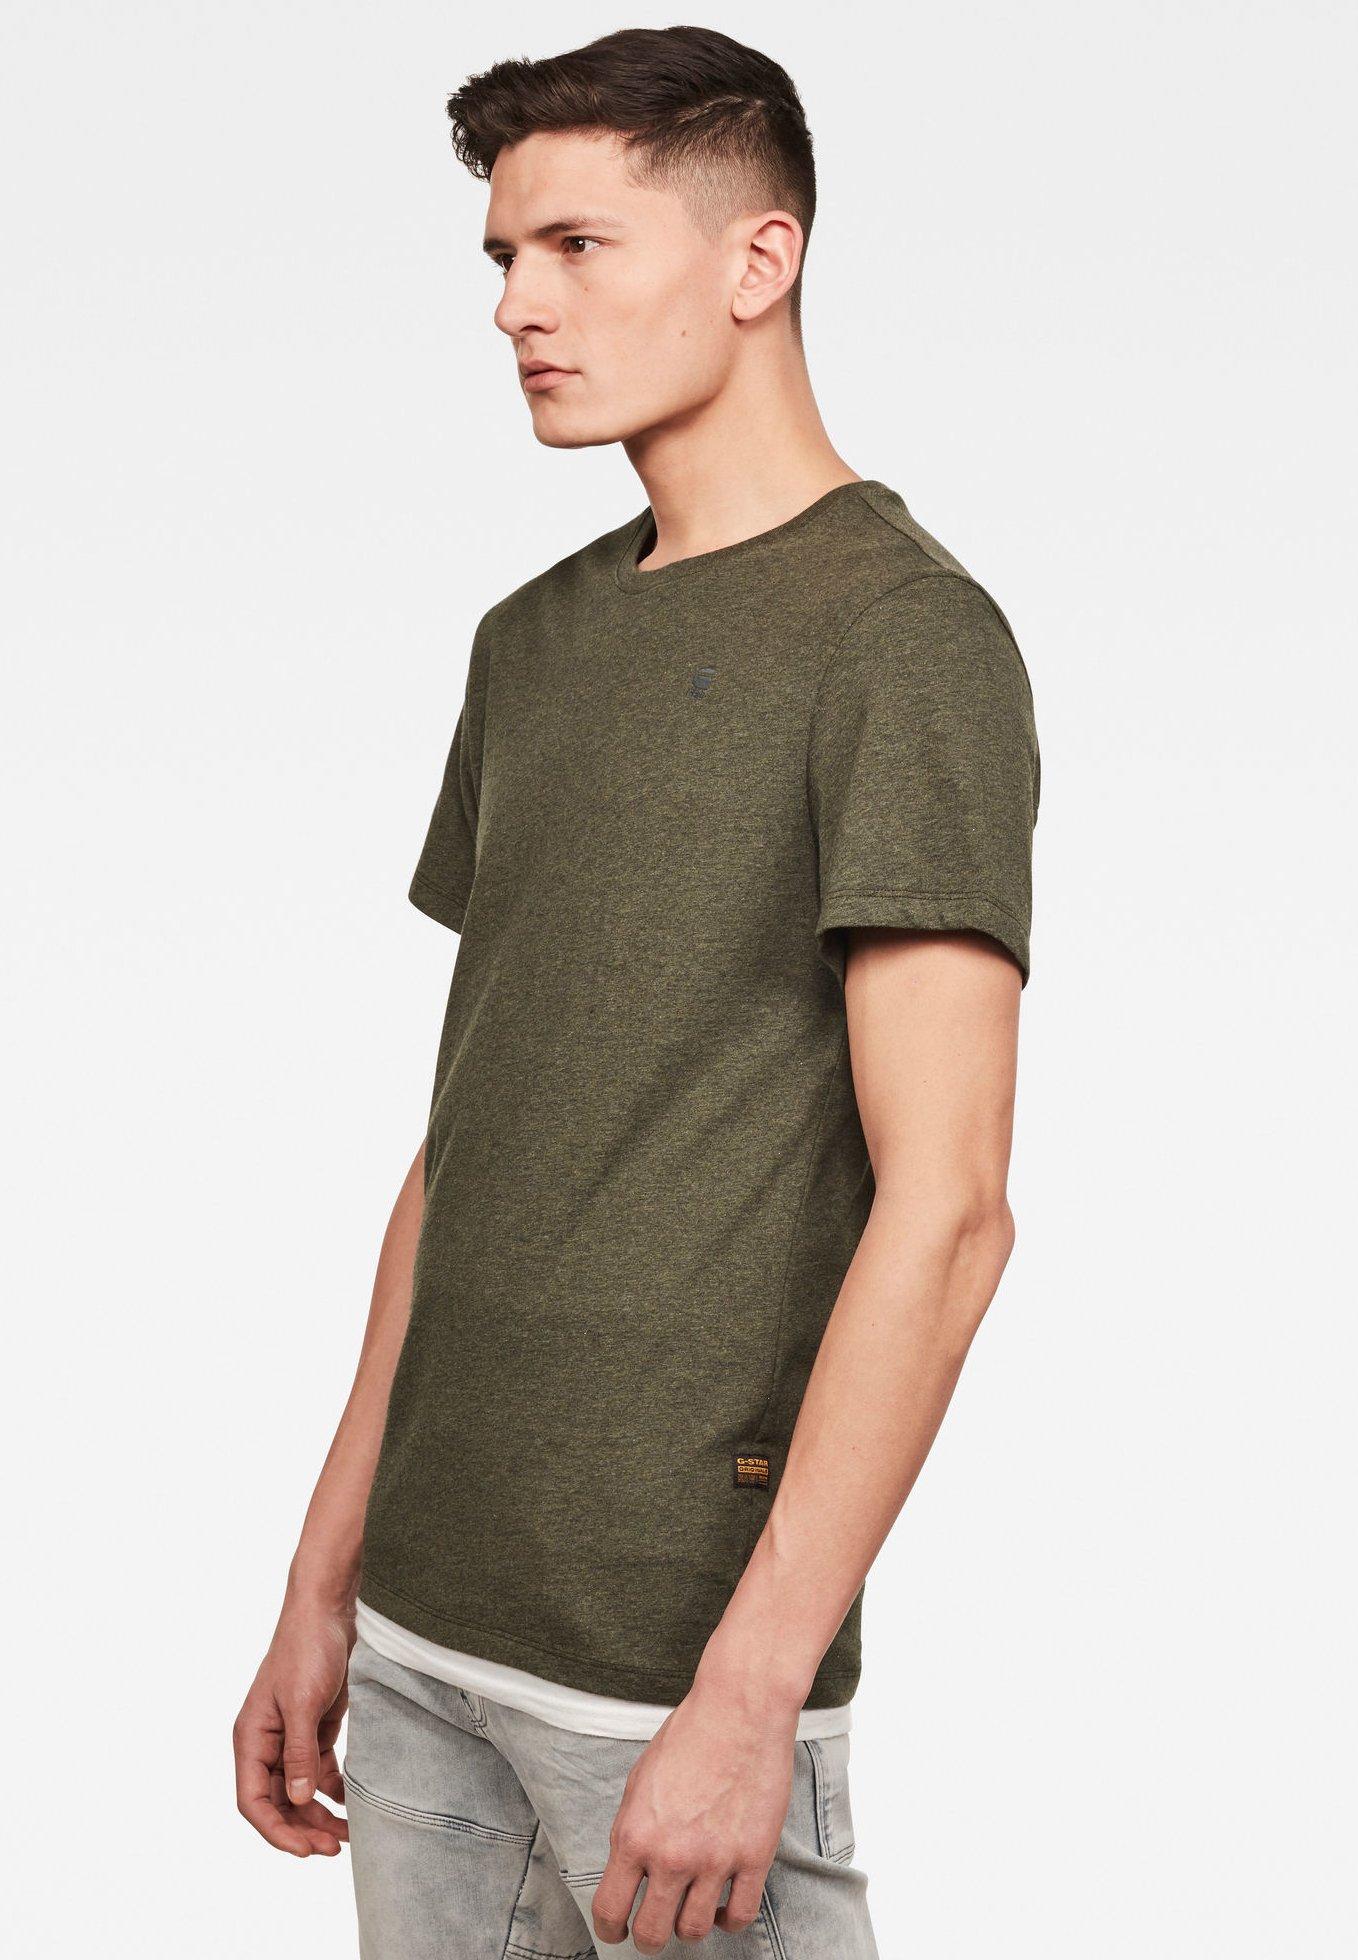 G-Star BASE-S R T S\S - Basic T-shirt - green jMmOx